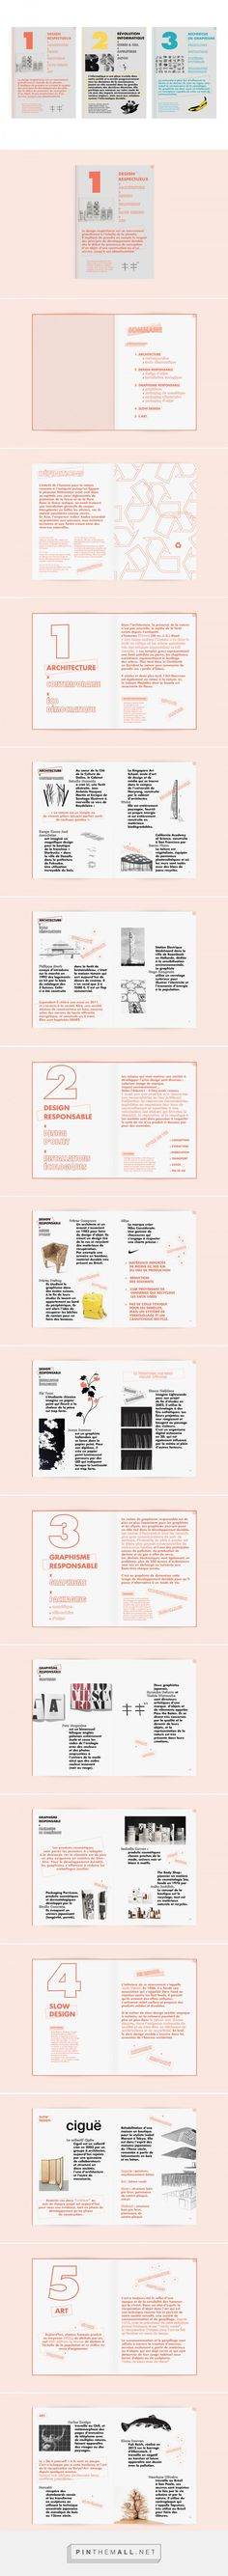 Édition - Histoire de l'Art on Behance... - a grouped images picture - Pin Them All